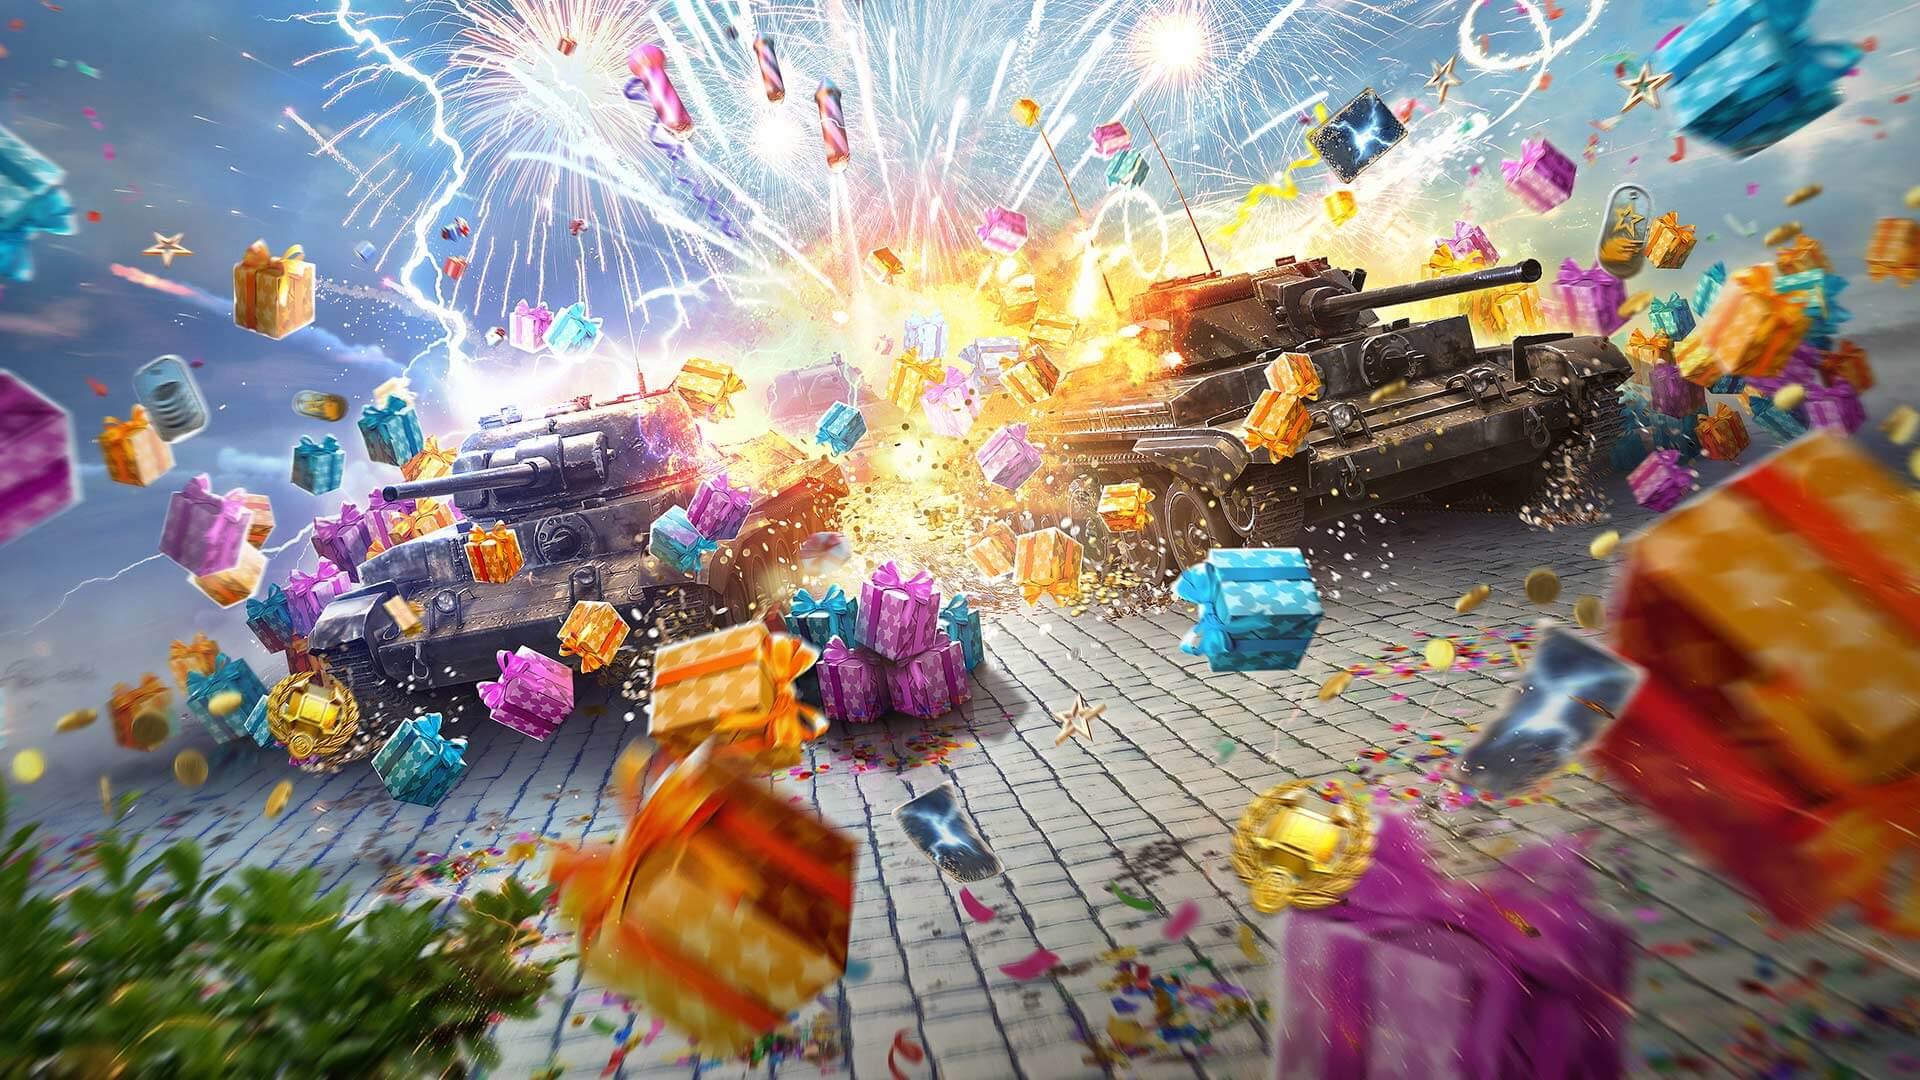 World of Tanks Blitz, Wargaming's premier mobile title, has